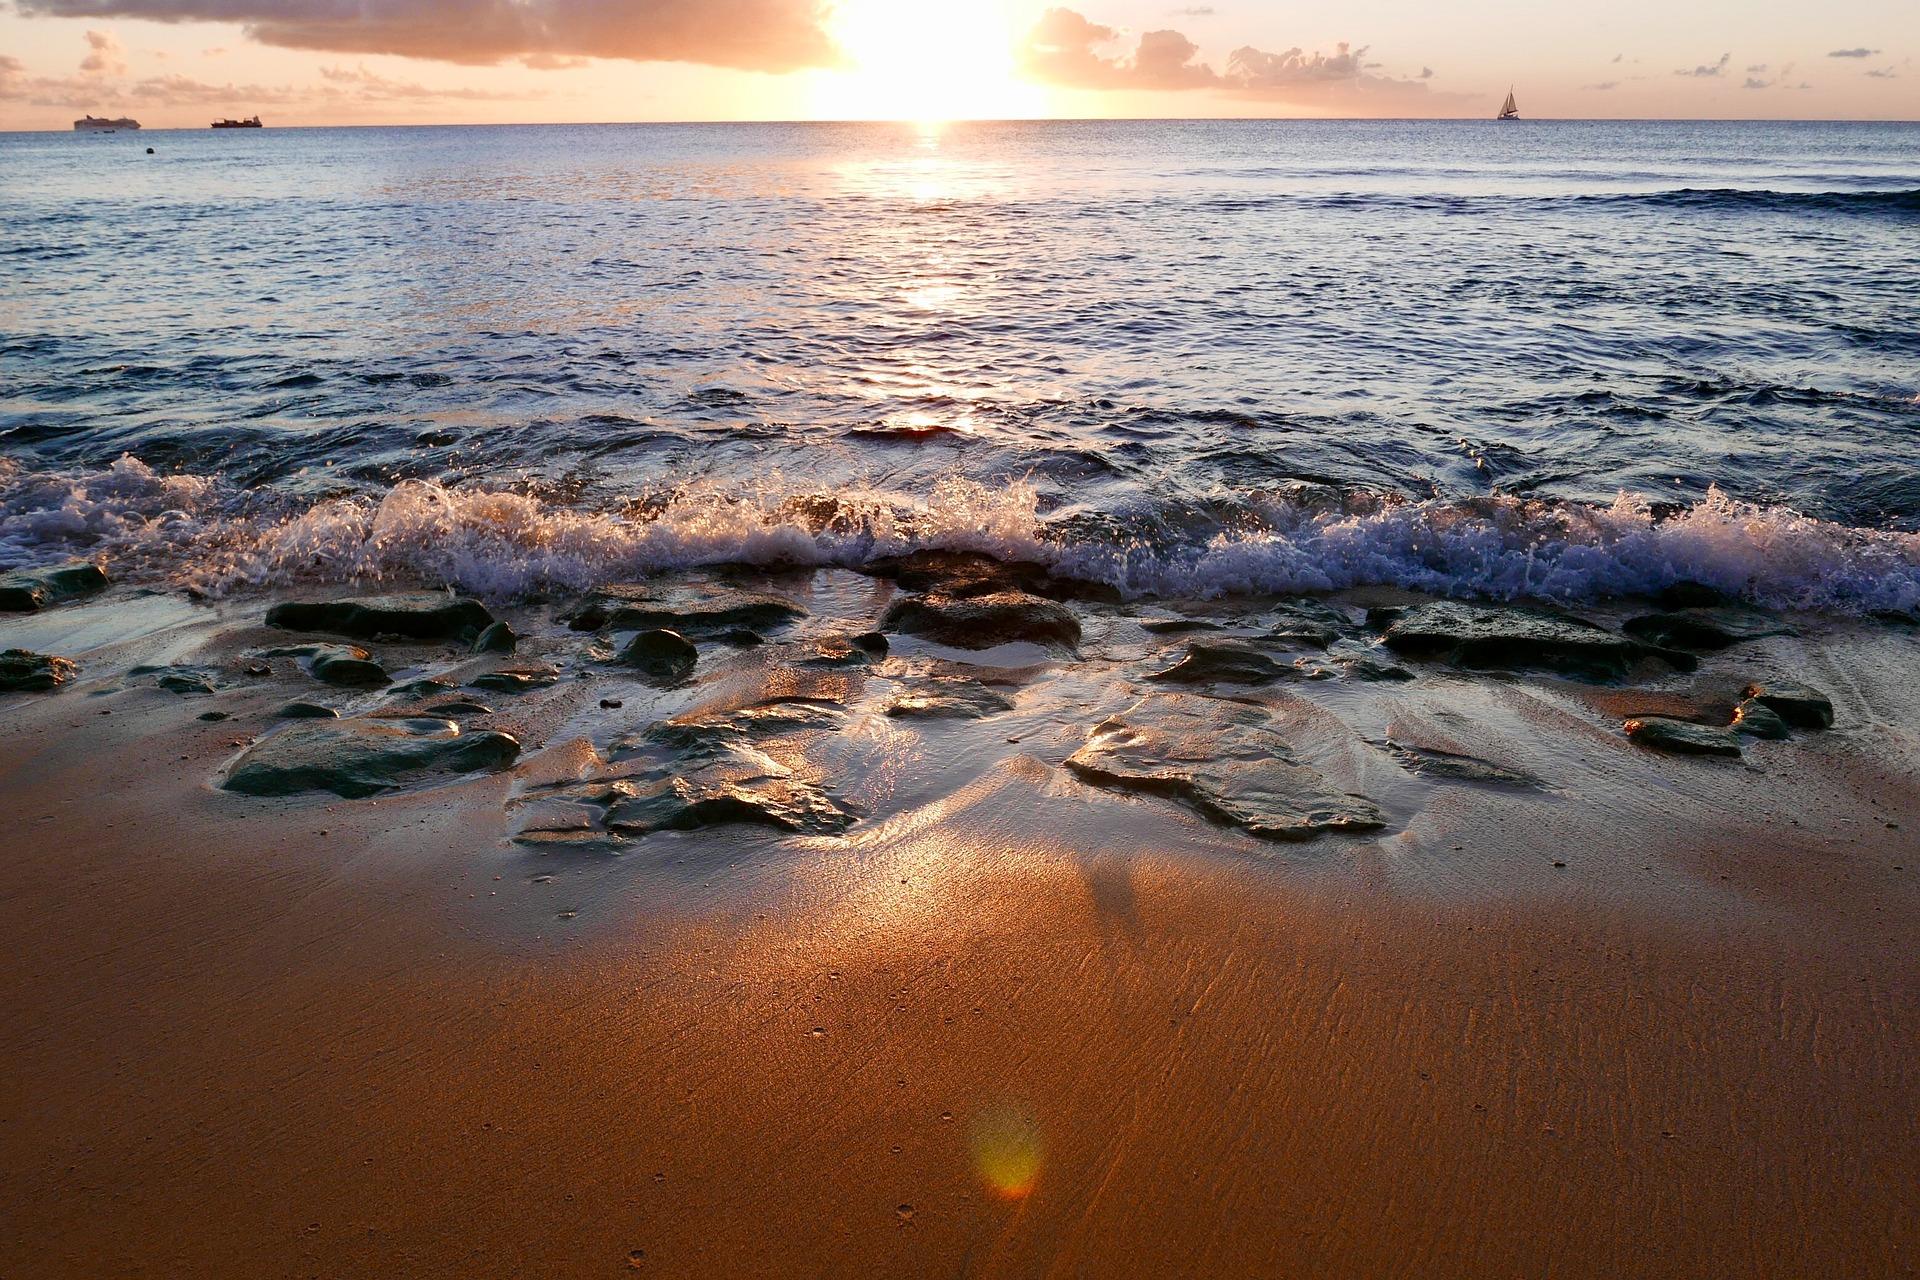 seashore-3912323_1920